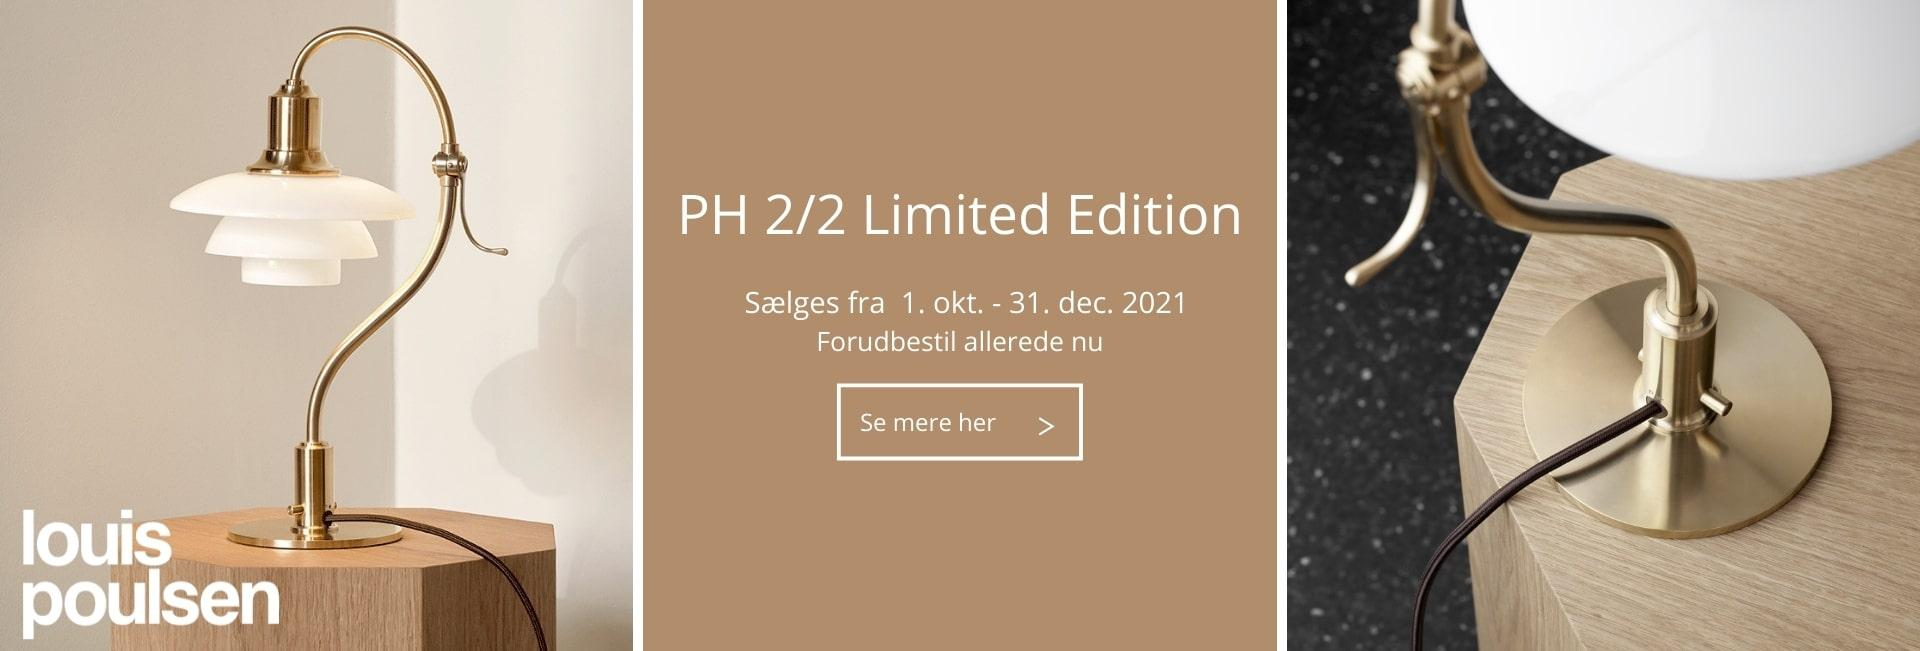 PH limited 2021